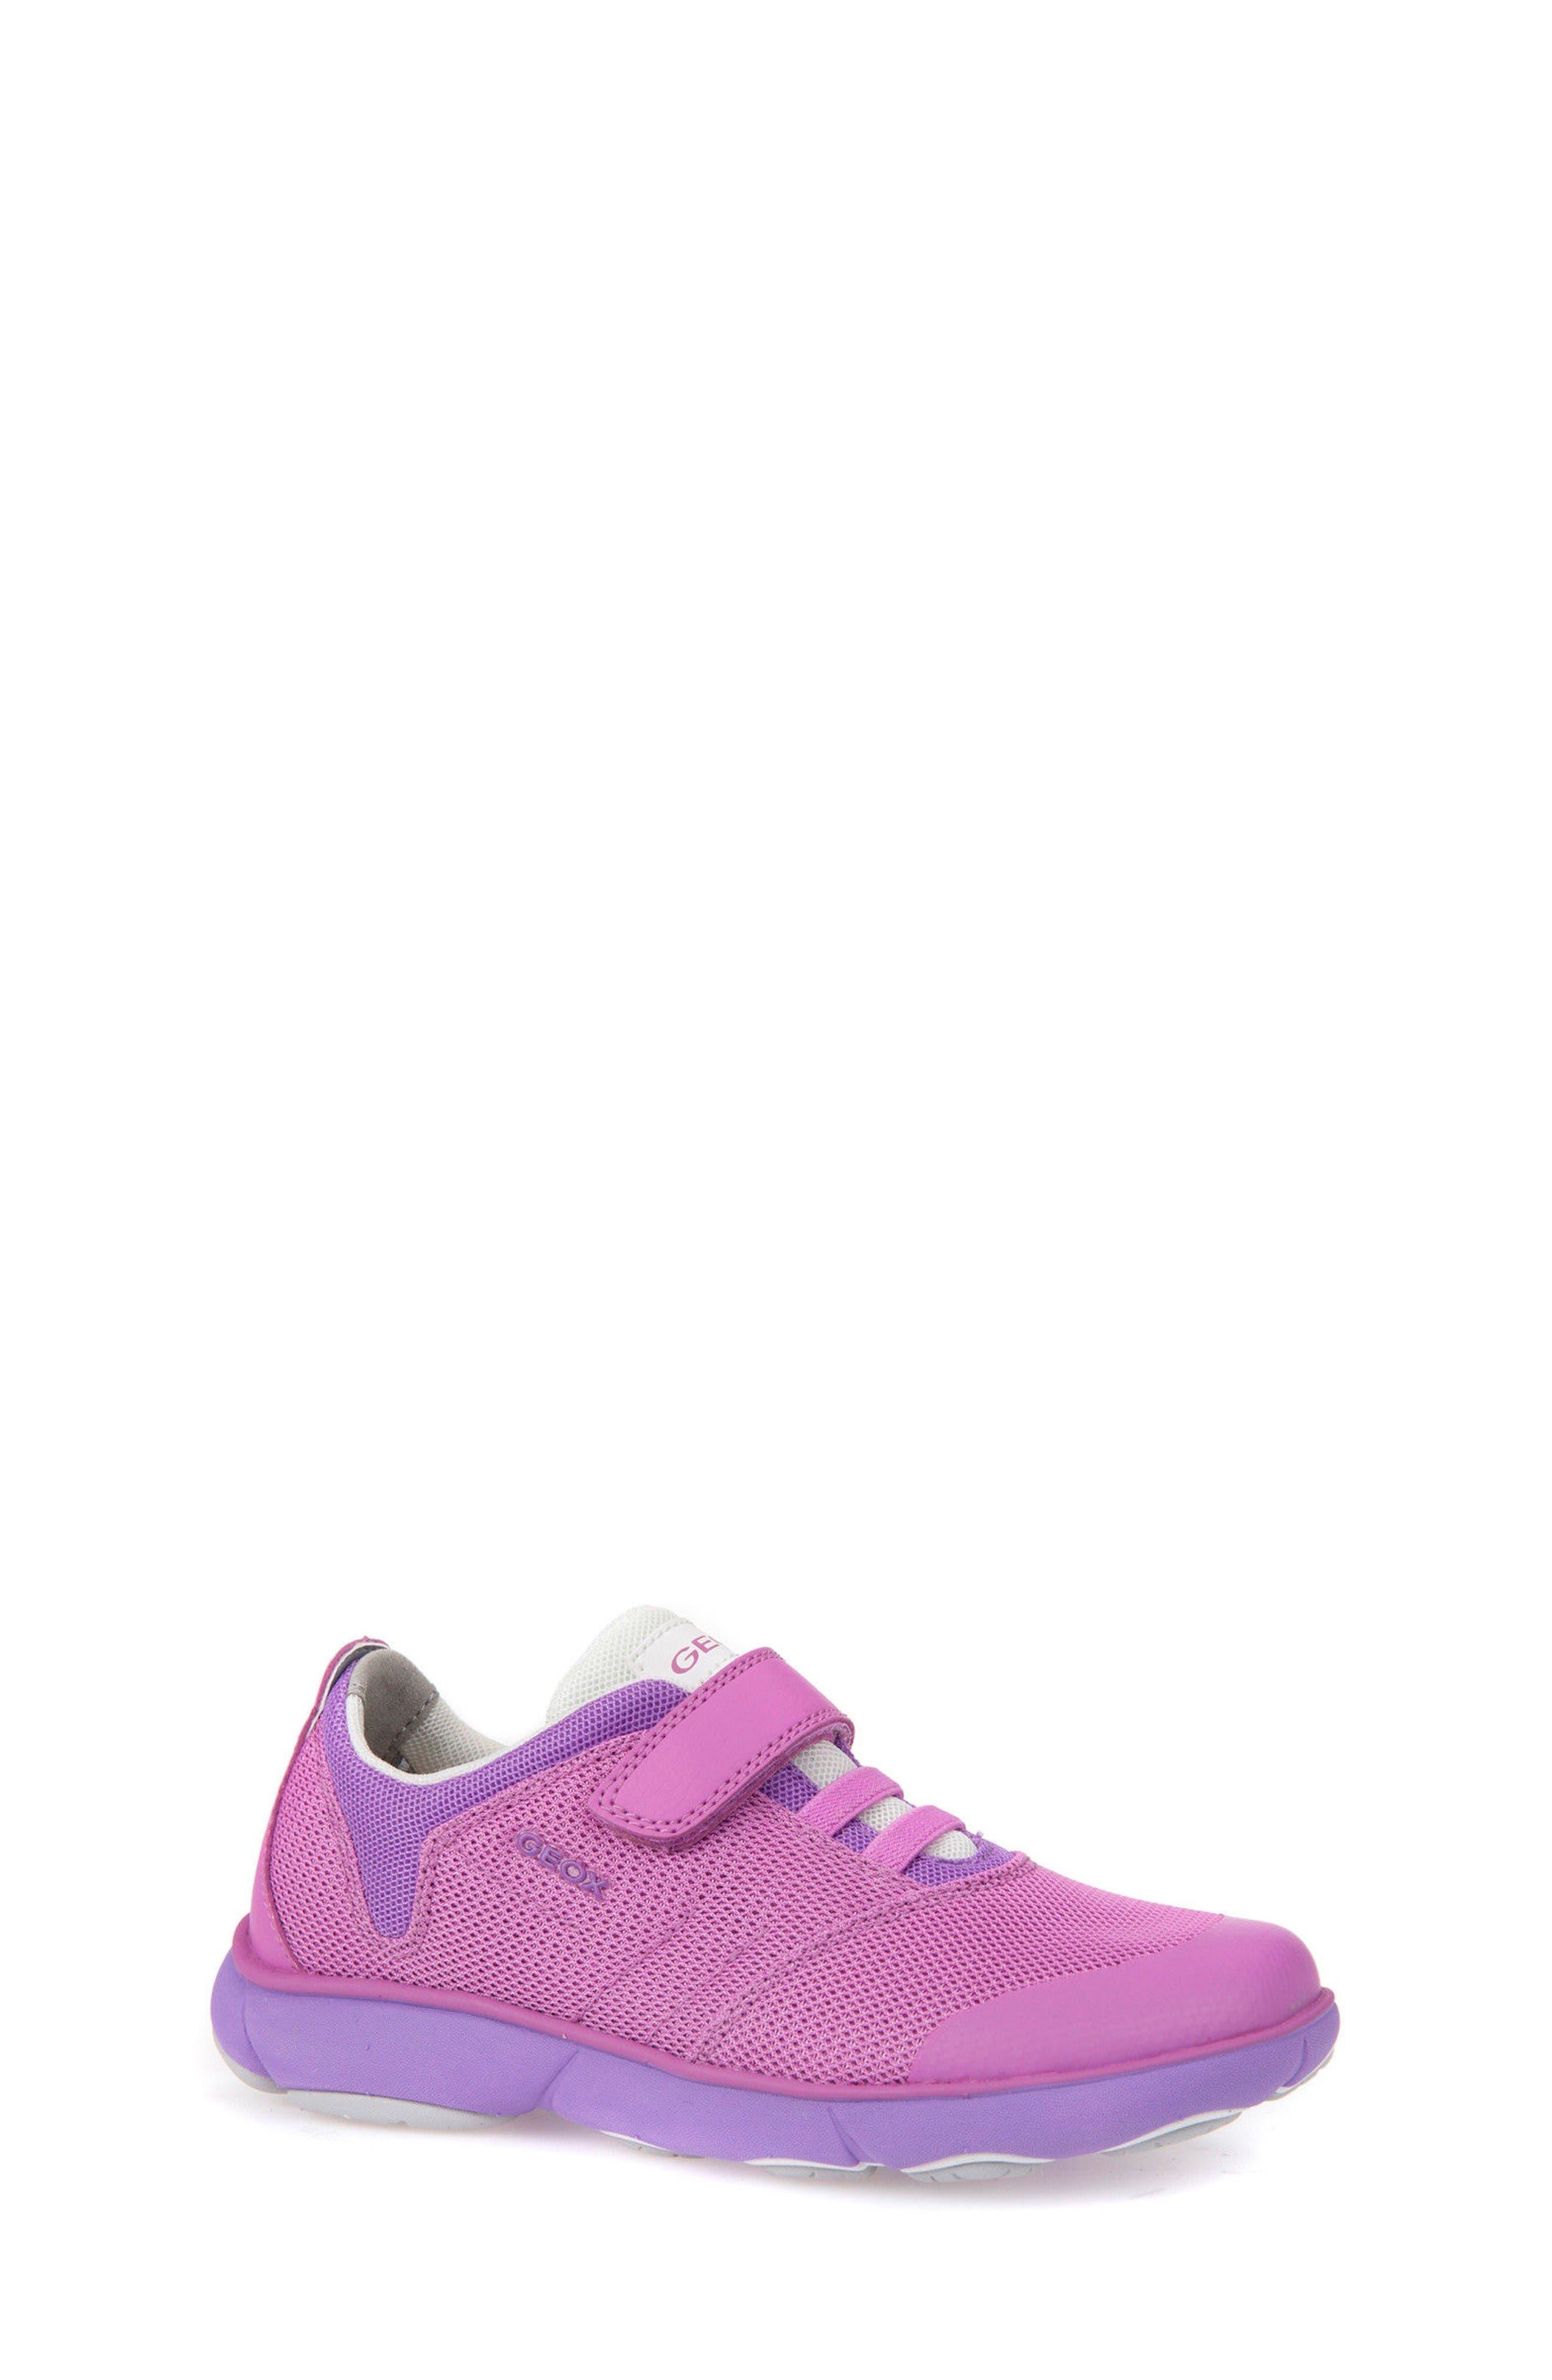 Jr Nebula Sneaker,                         Main,                         color, Fuchsia